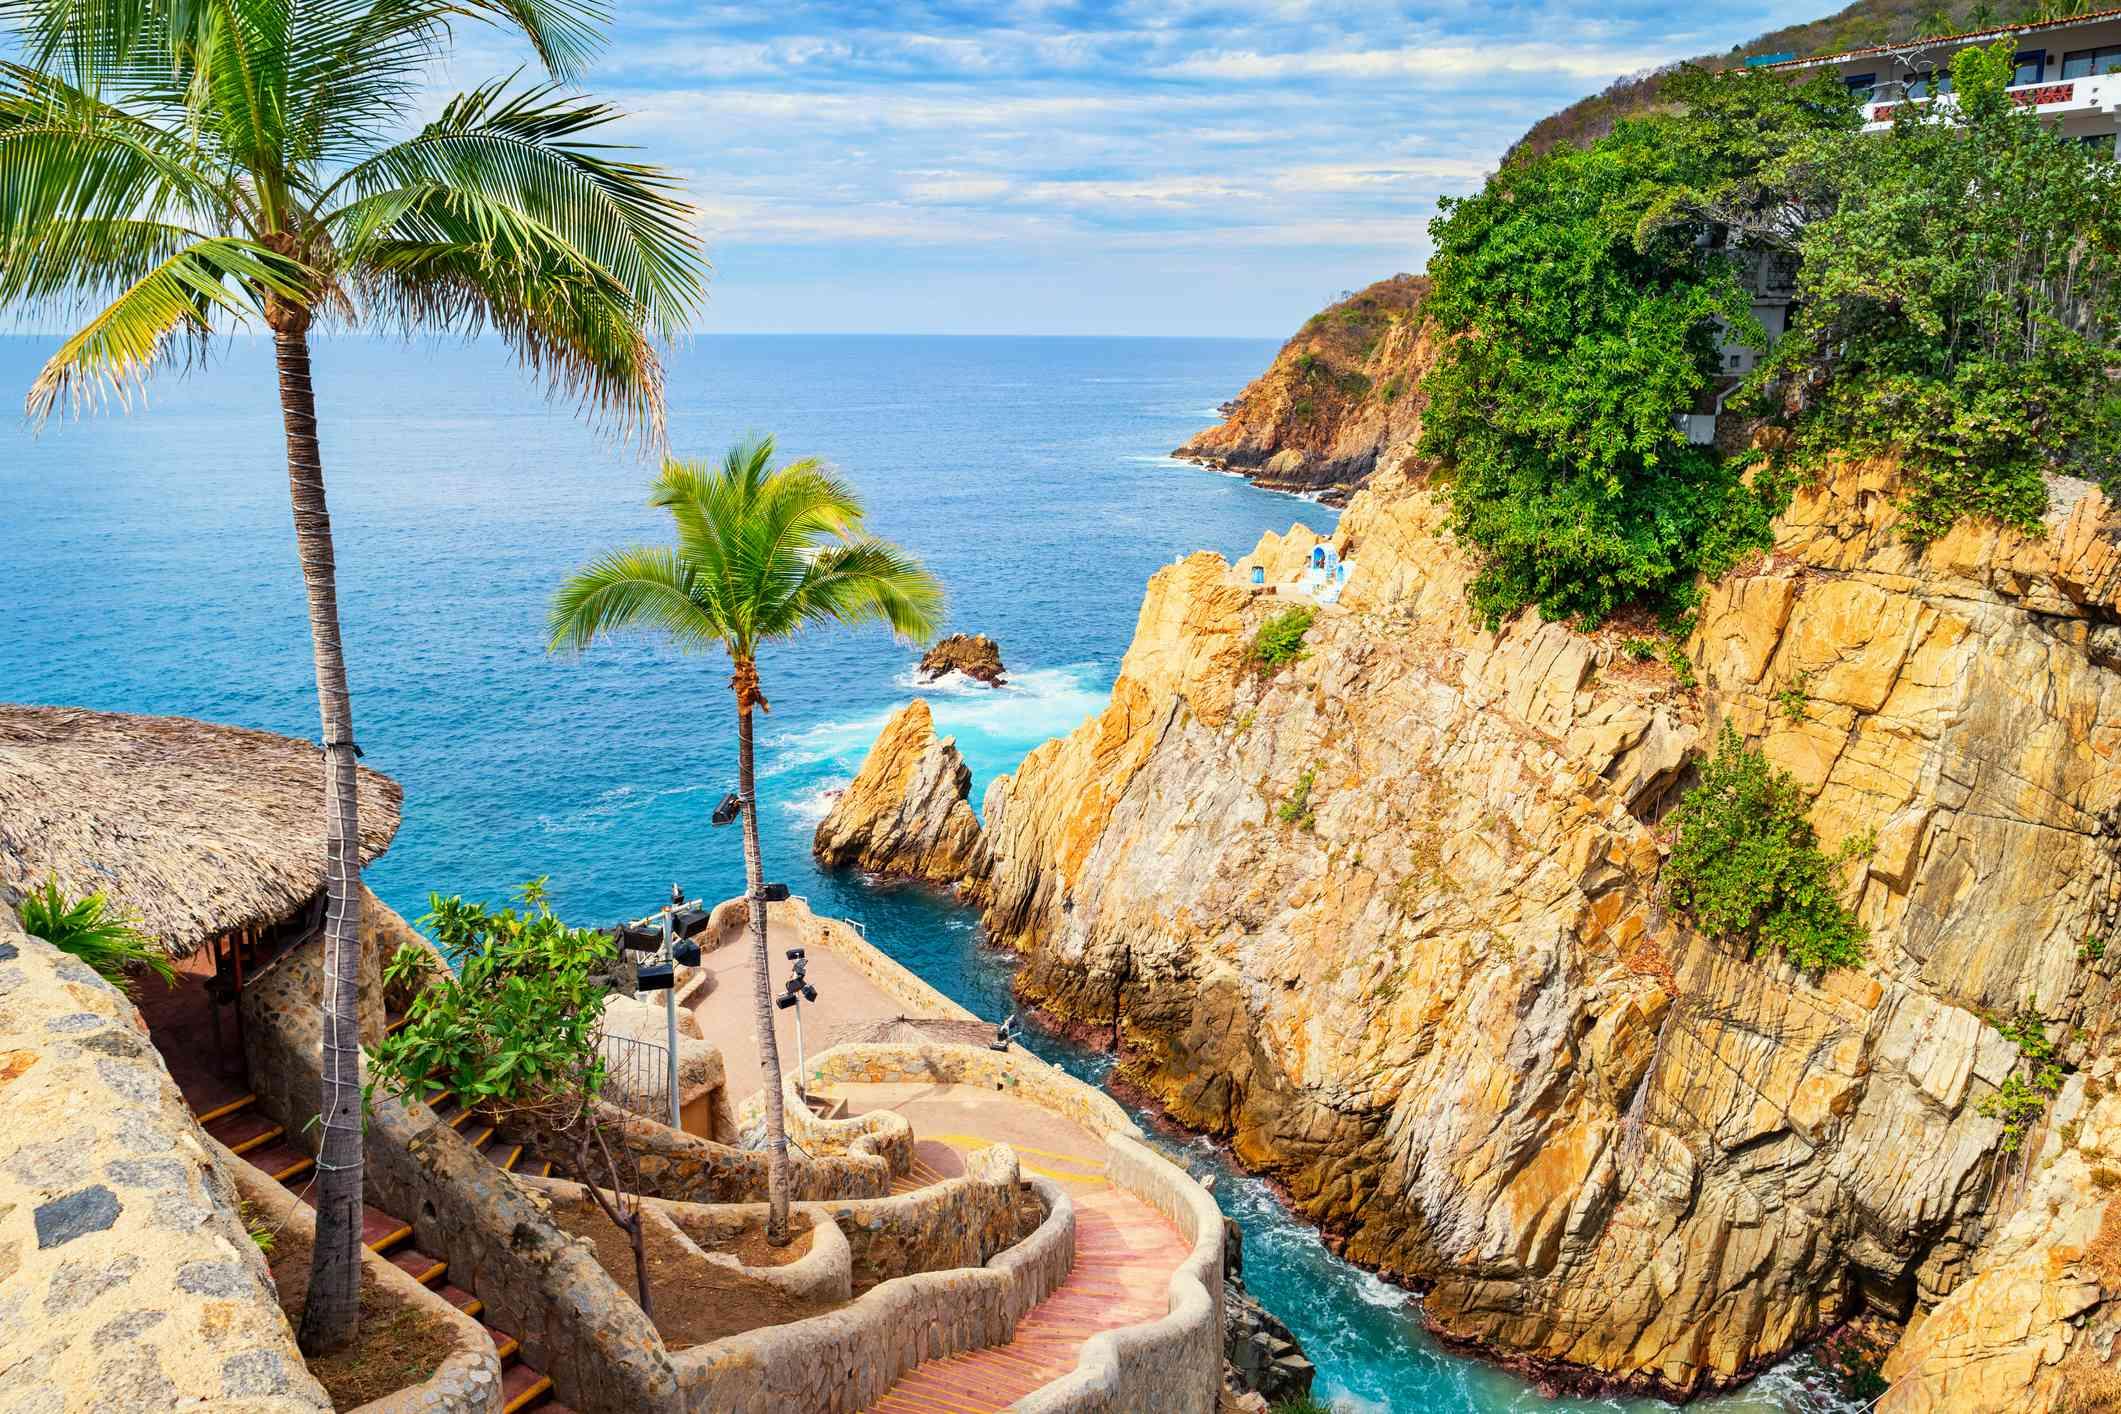 La Quebrada Cliffs and Promenade in Acapulco Mexico